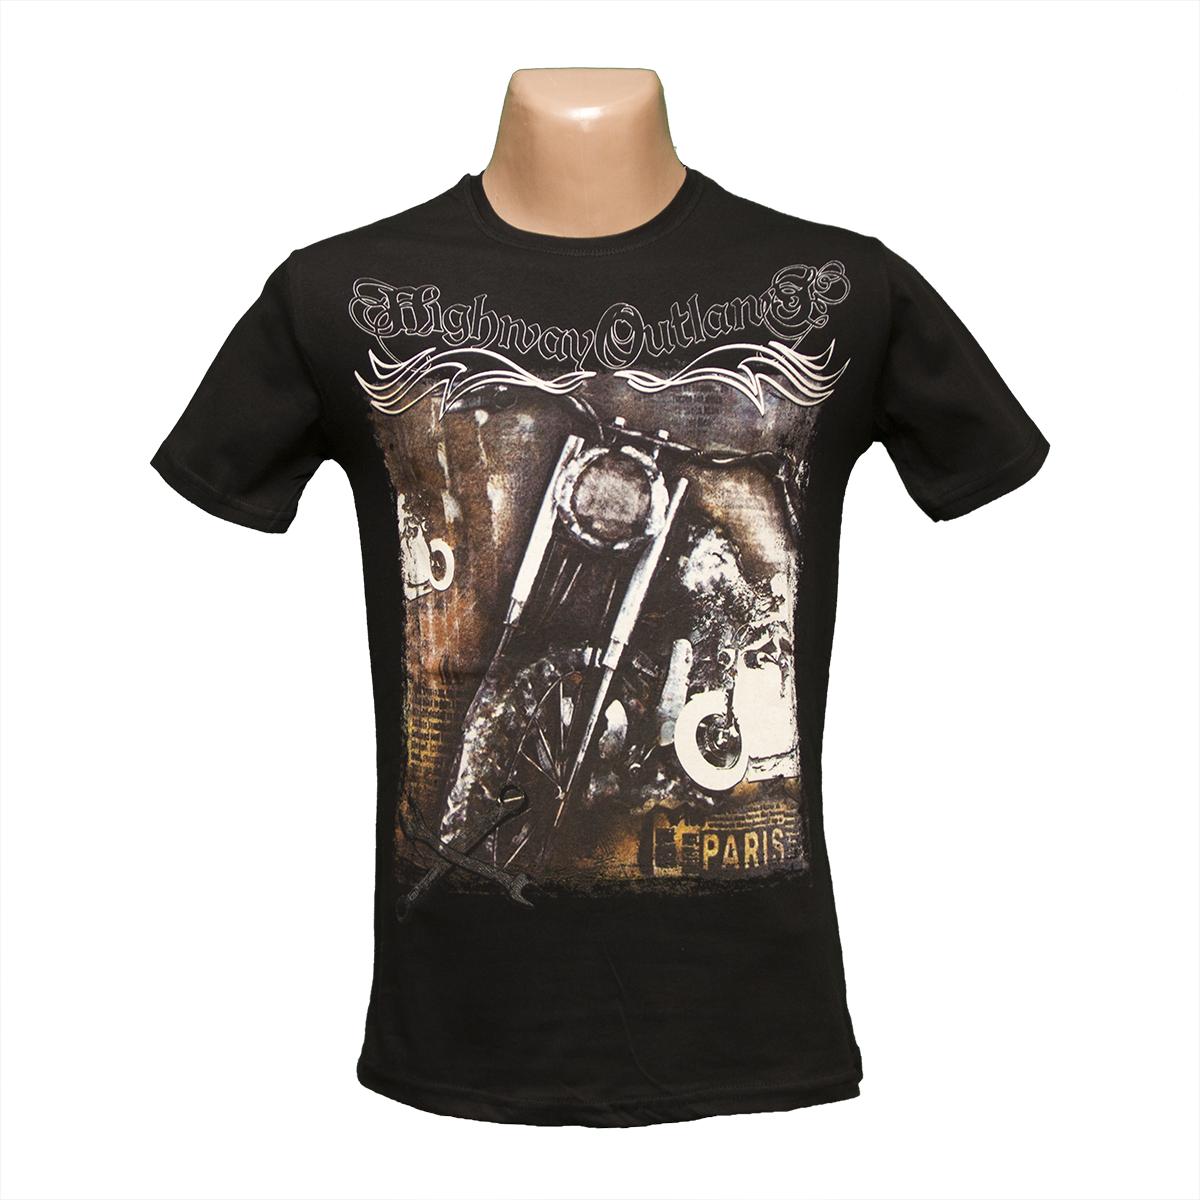 Молодіжна футболка бавовна БАЙК пр-під Туреччина H4625